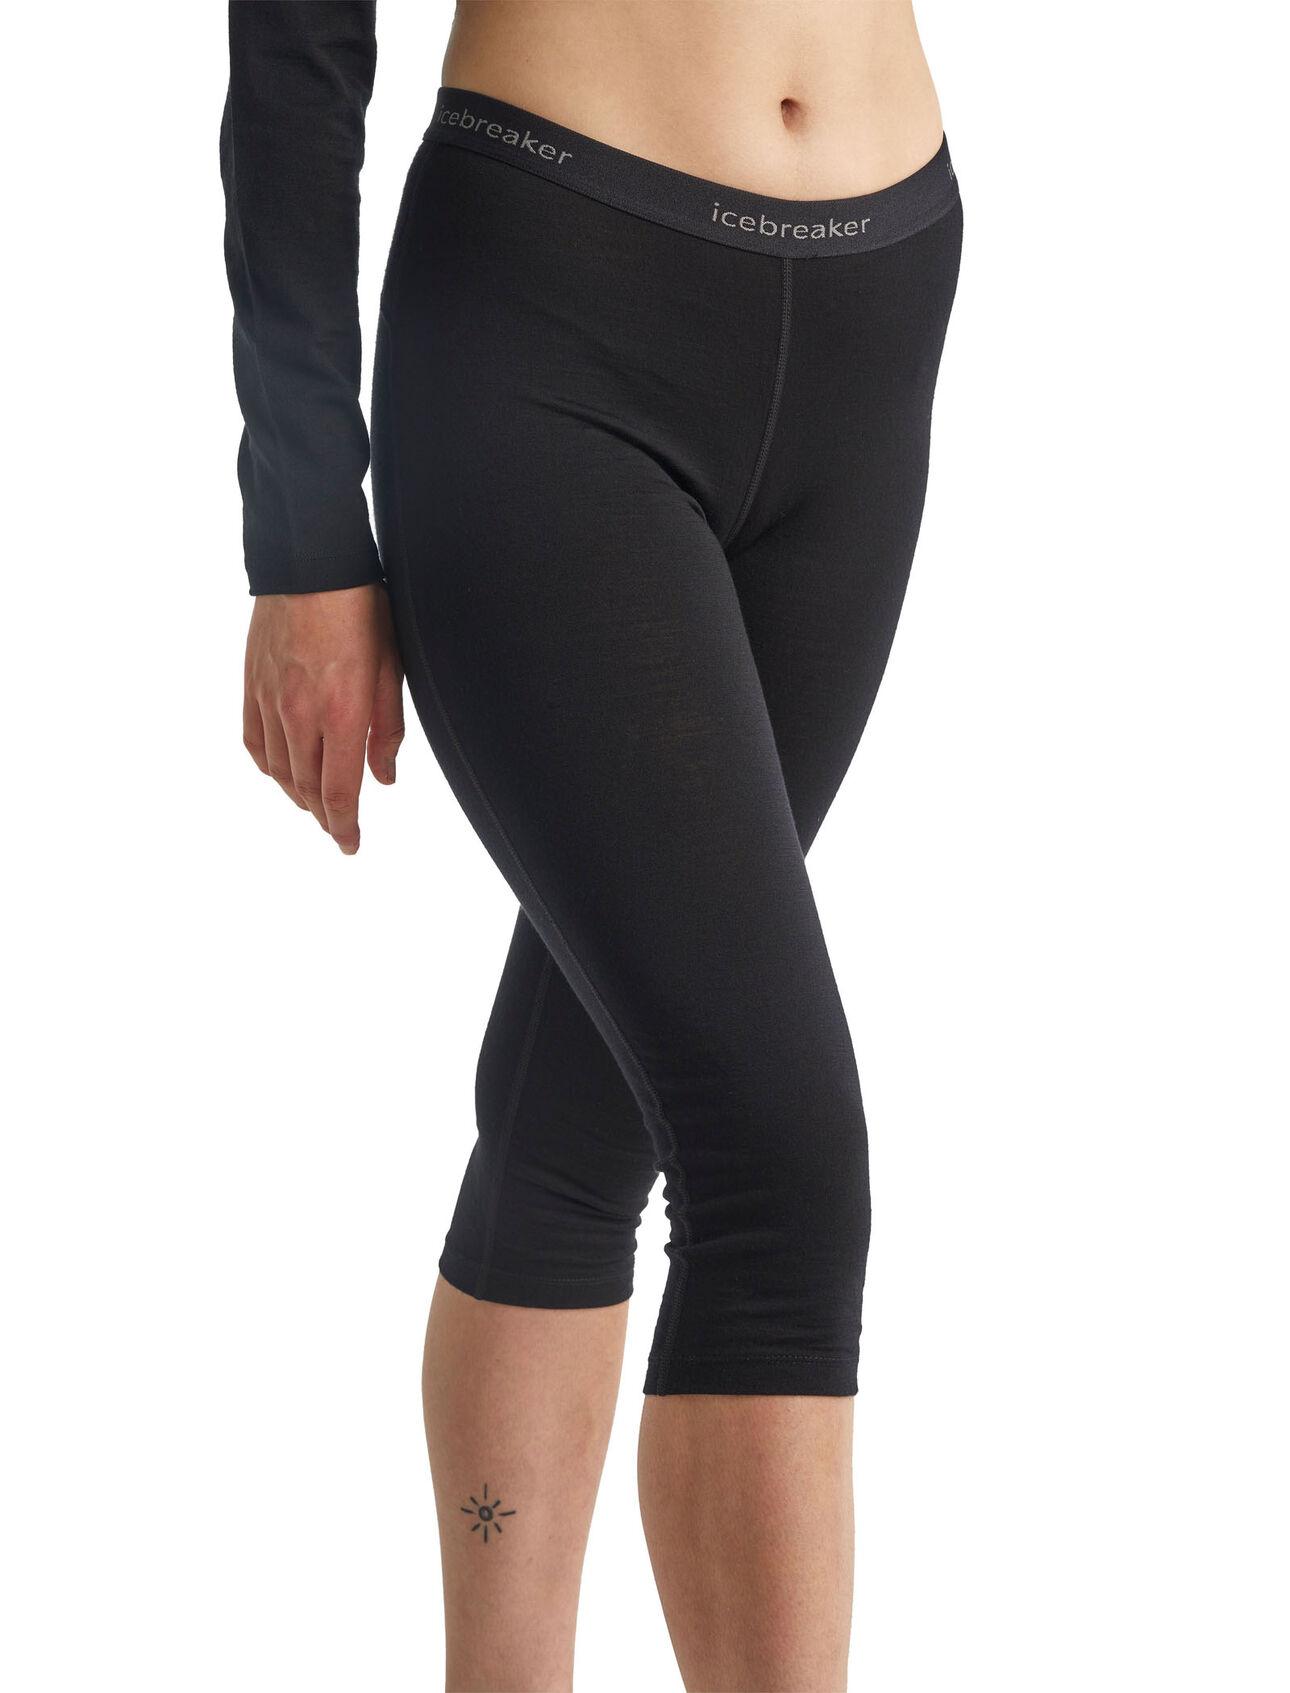 Donna Icebreaker Merino 200 Oasis Cold Weather Leggings Wool Base Layer Thermal Pants